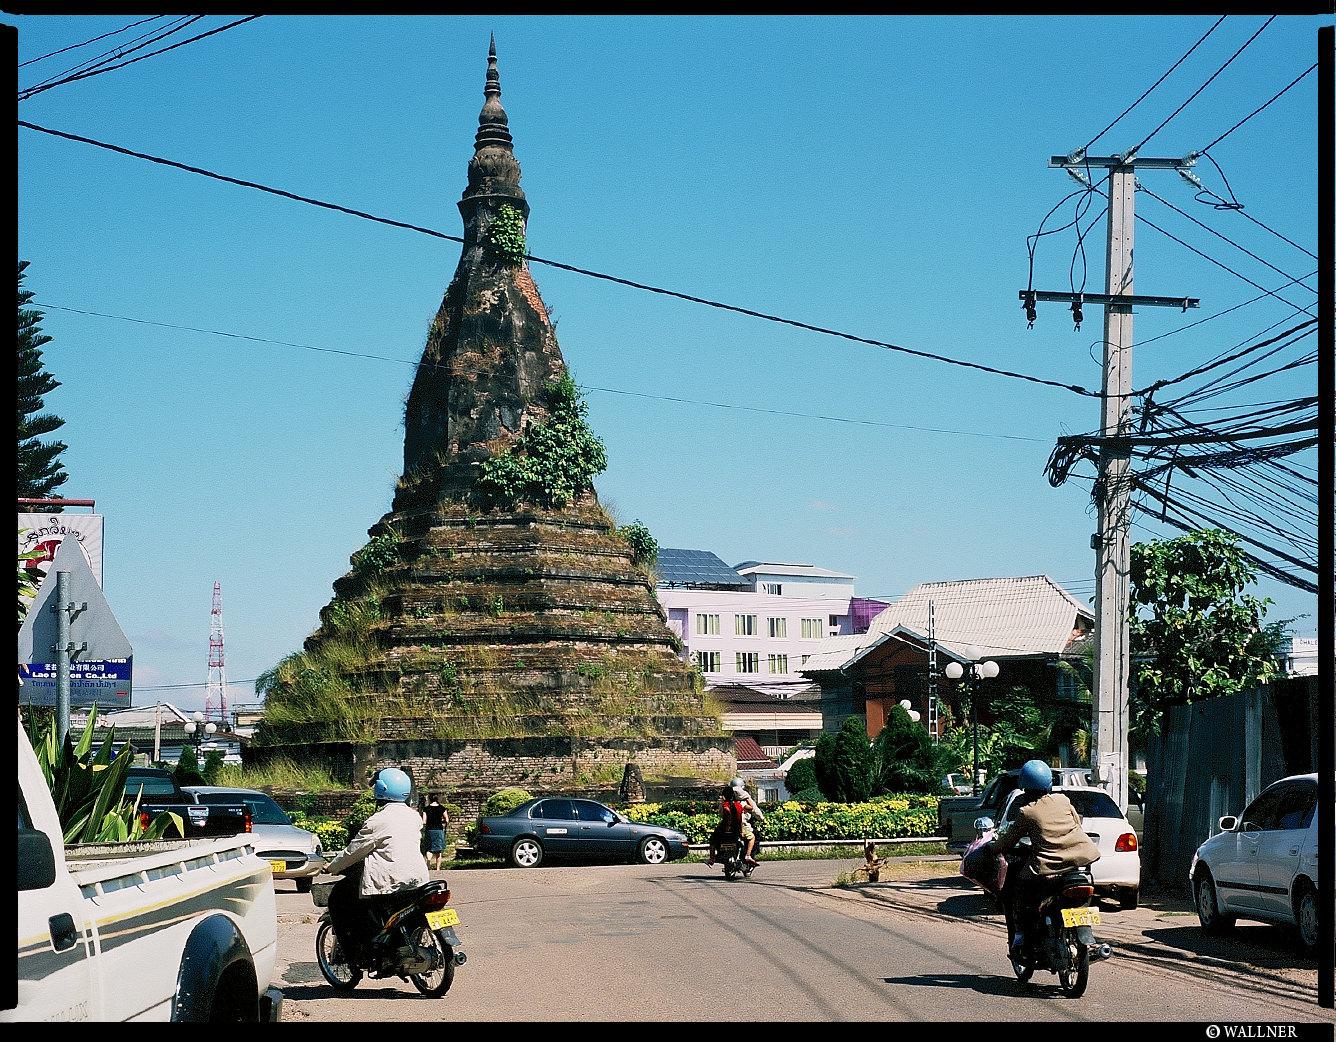 MediumFormatPatrikWallner_Vientiane_AroundThePointyThingLOWQ